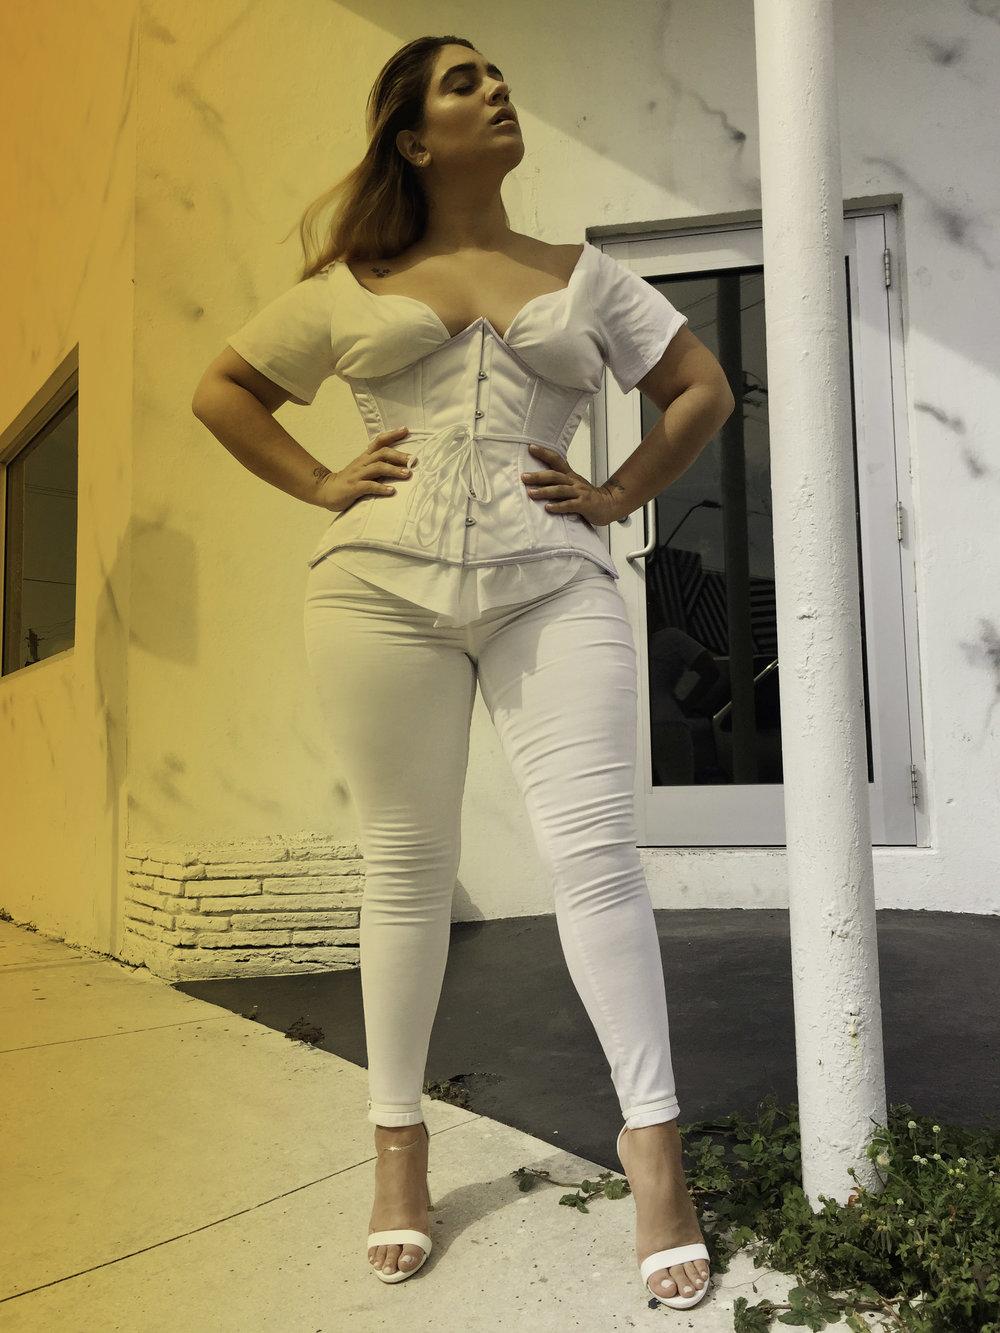 Orchard corset, Forever 21 top,Topshop jeans, Steve Madden heels